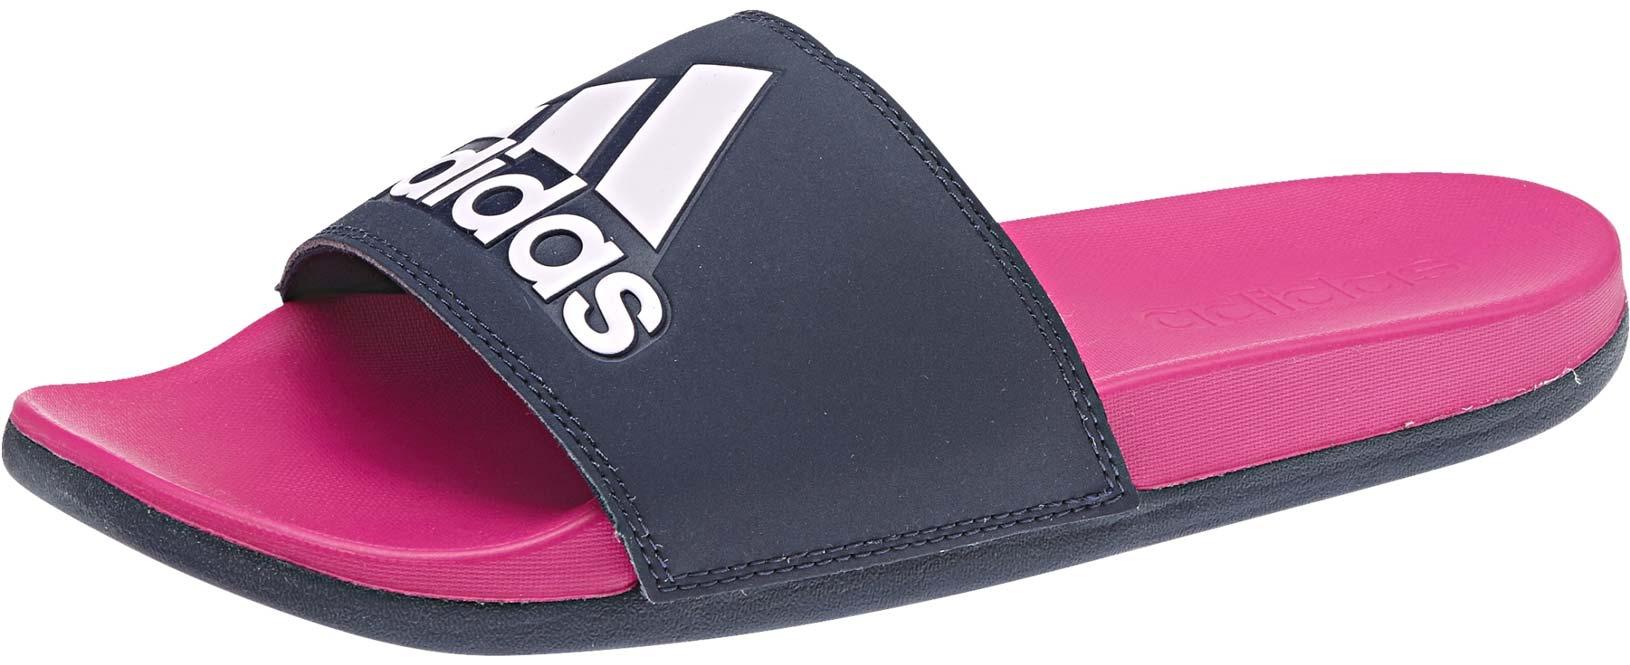 adidas ADILETTE CF+LOGO W. Női papucs. Női papucs. Női papucs. 1 13776ee516